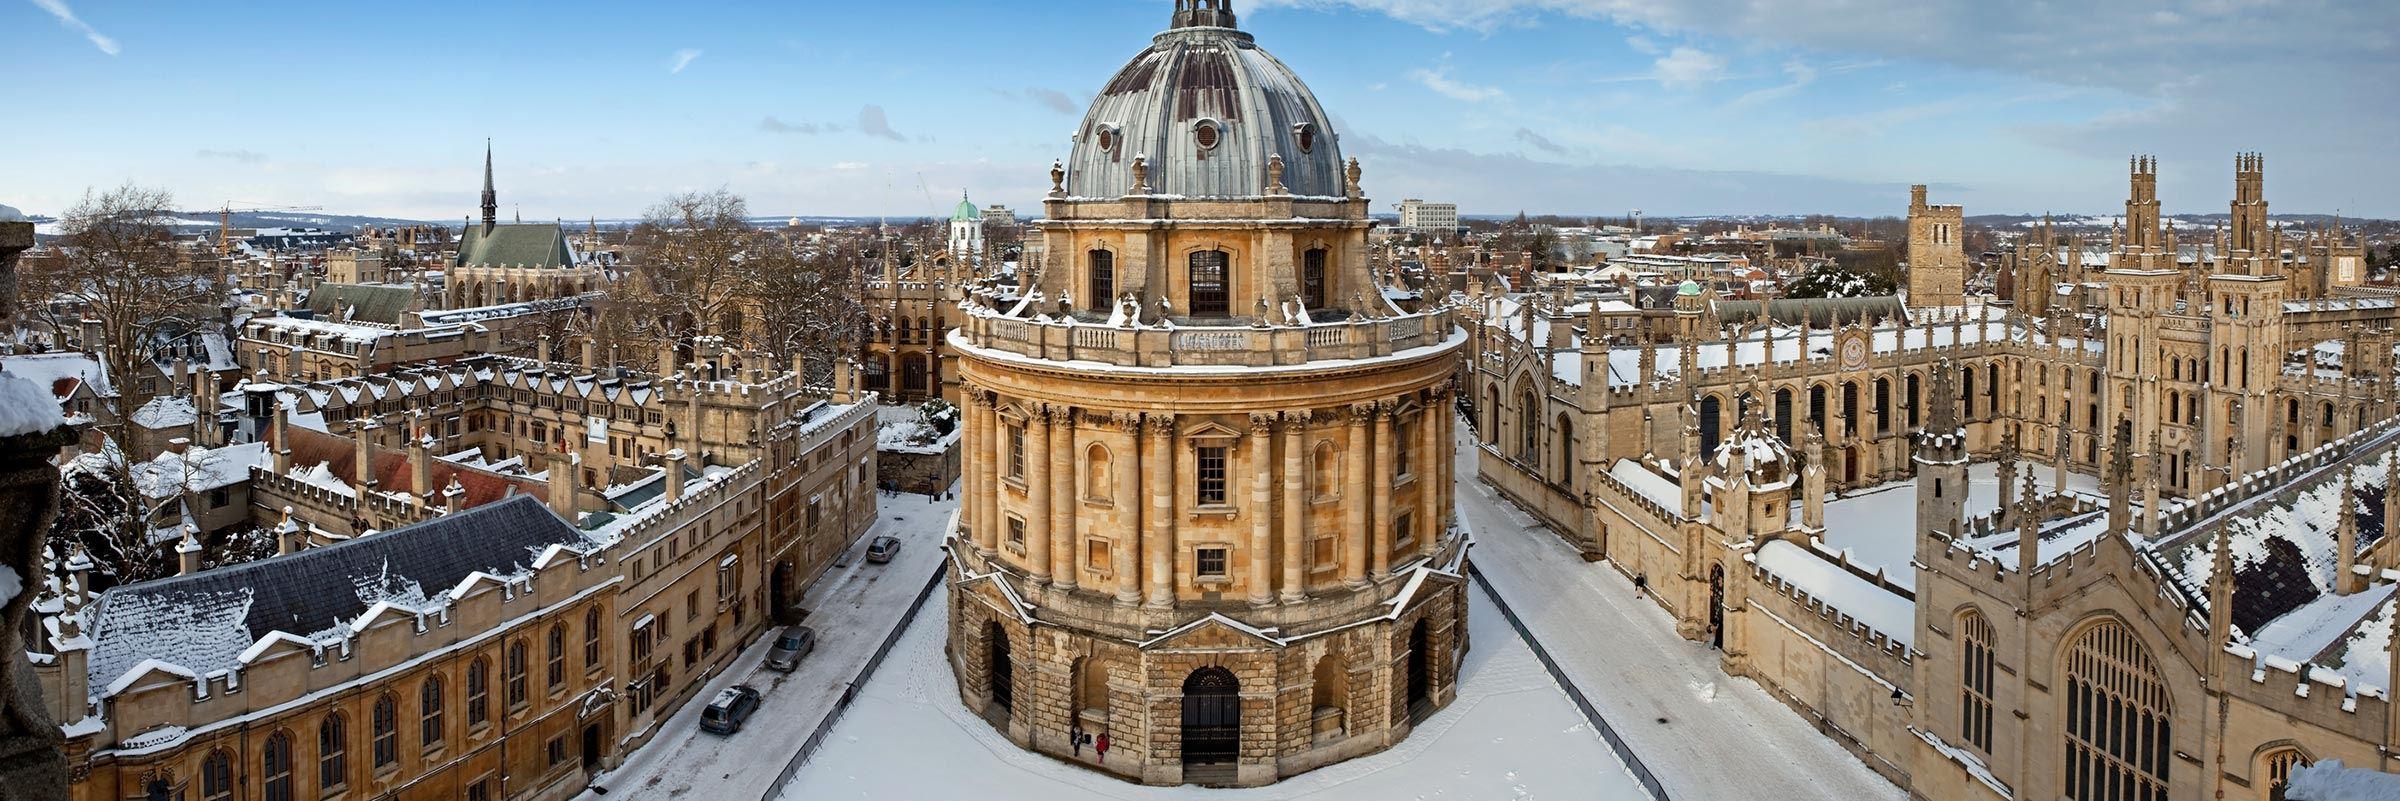 Visit Oxford, England